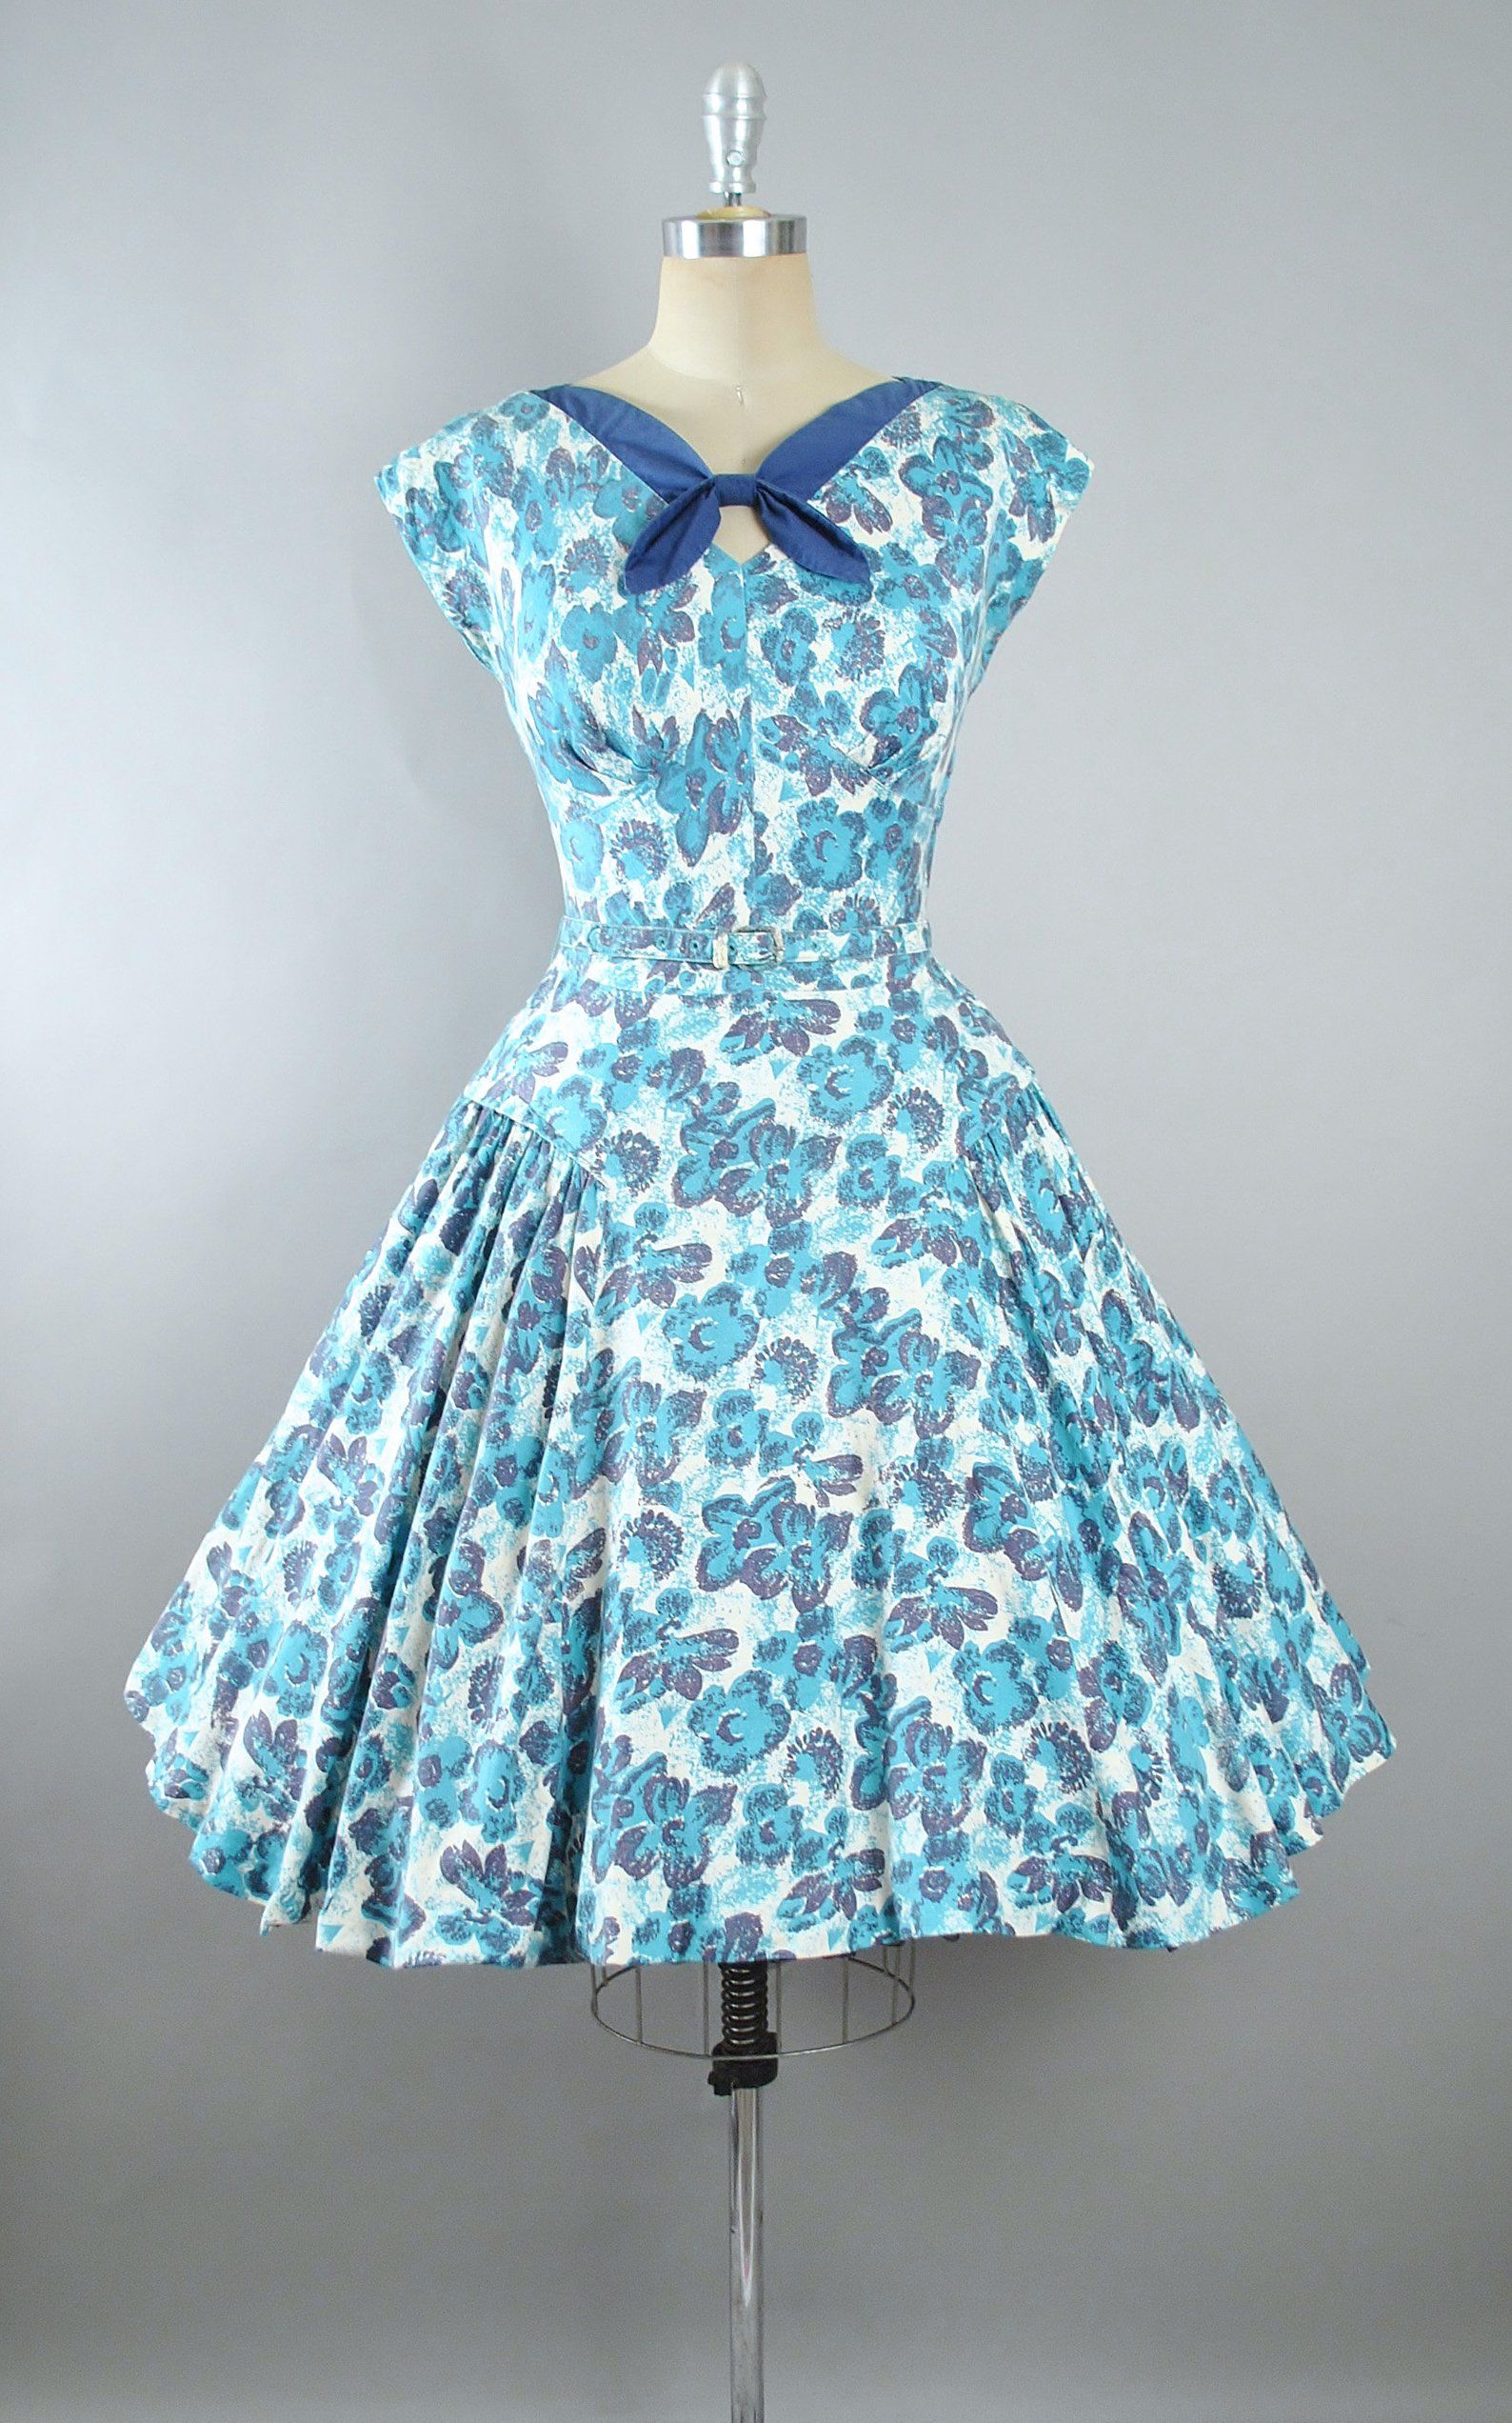 Vintage 50s Dress 1950s Cotton Belted Sundress Turquoise Etsy Vintage Dresses 50s Dresses Vintage 1950s Dresses [ 2544 x 1588 Pixel ]